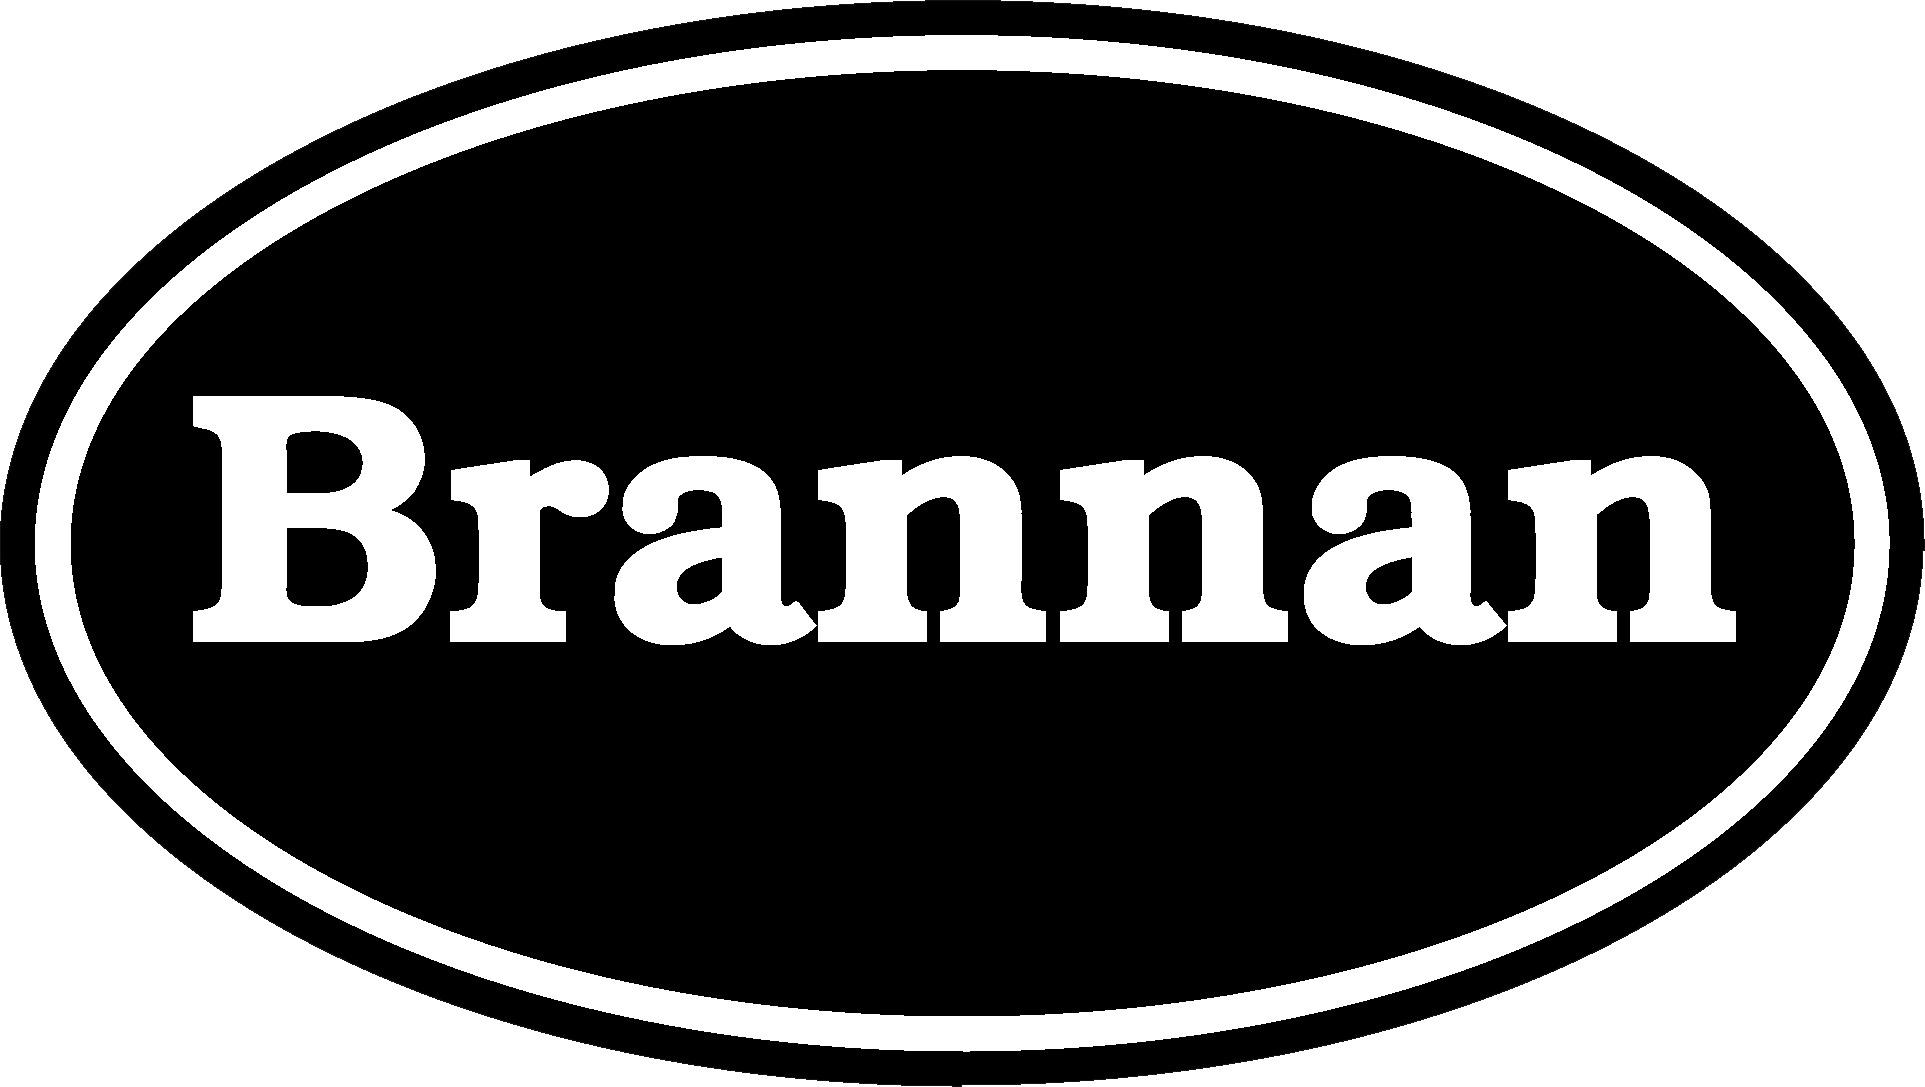 Brannan Logo